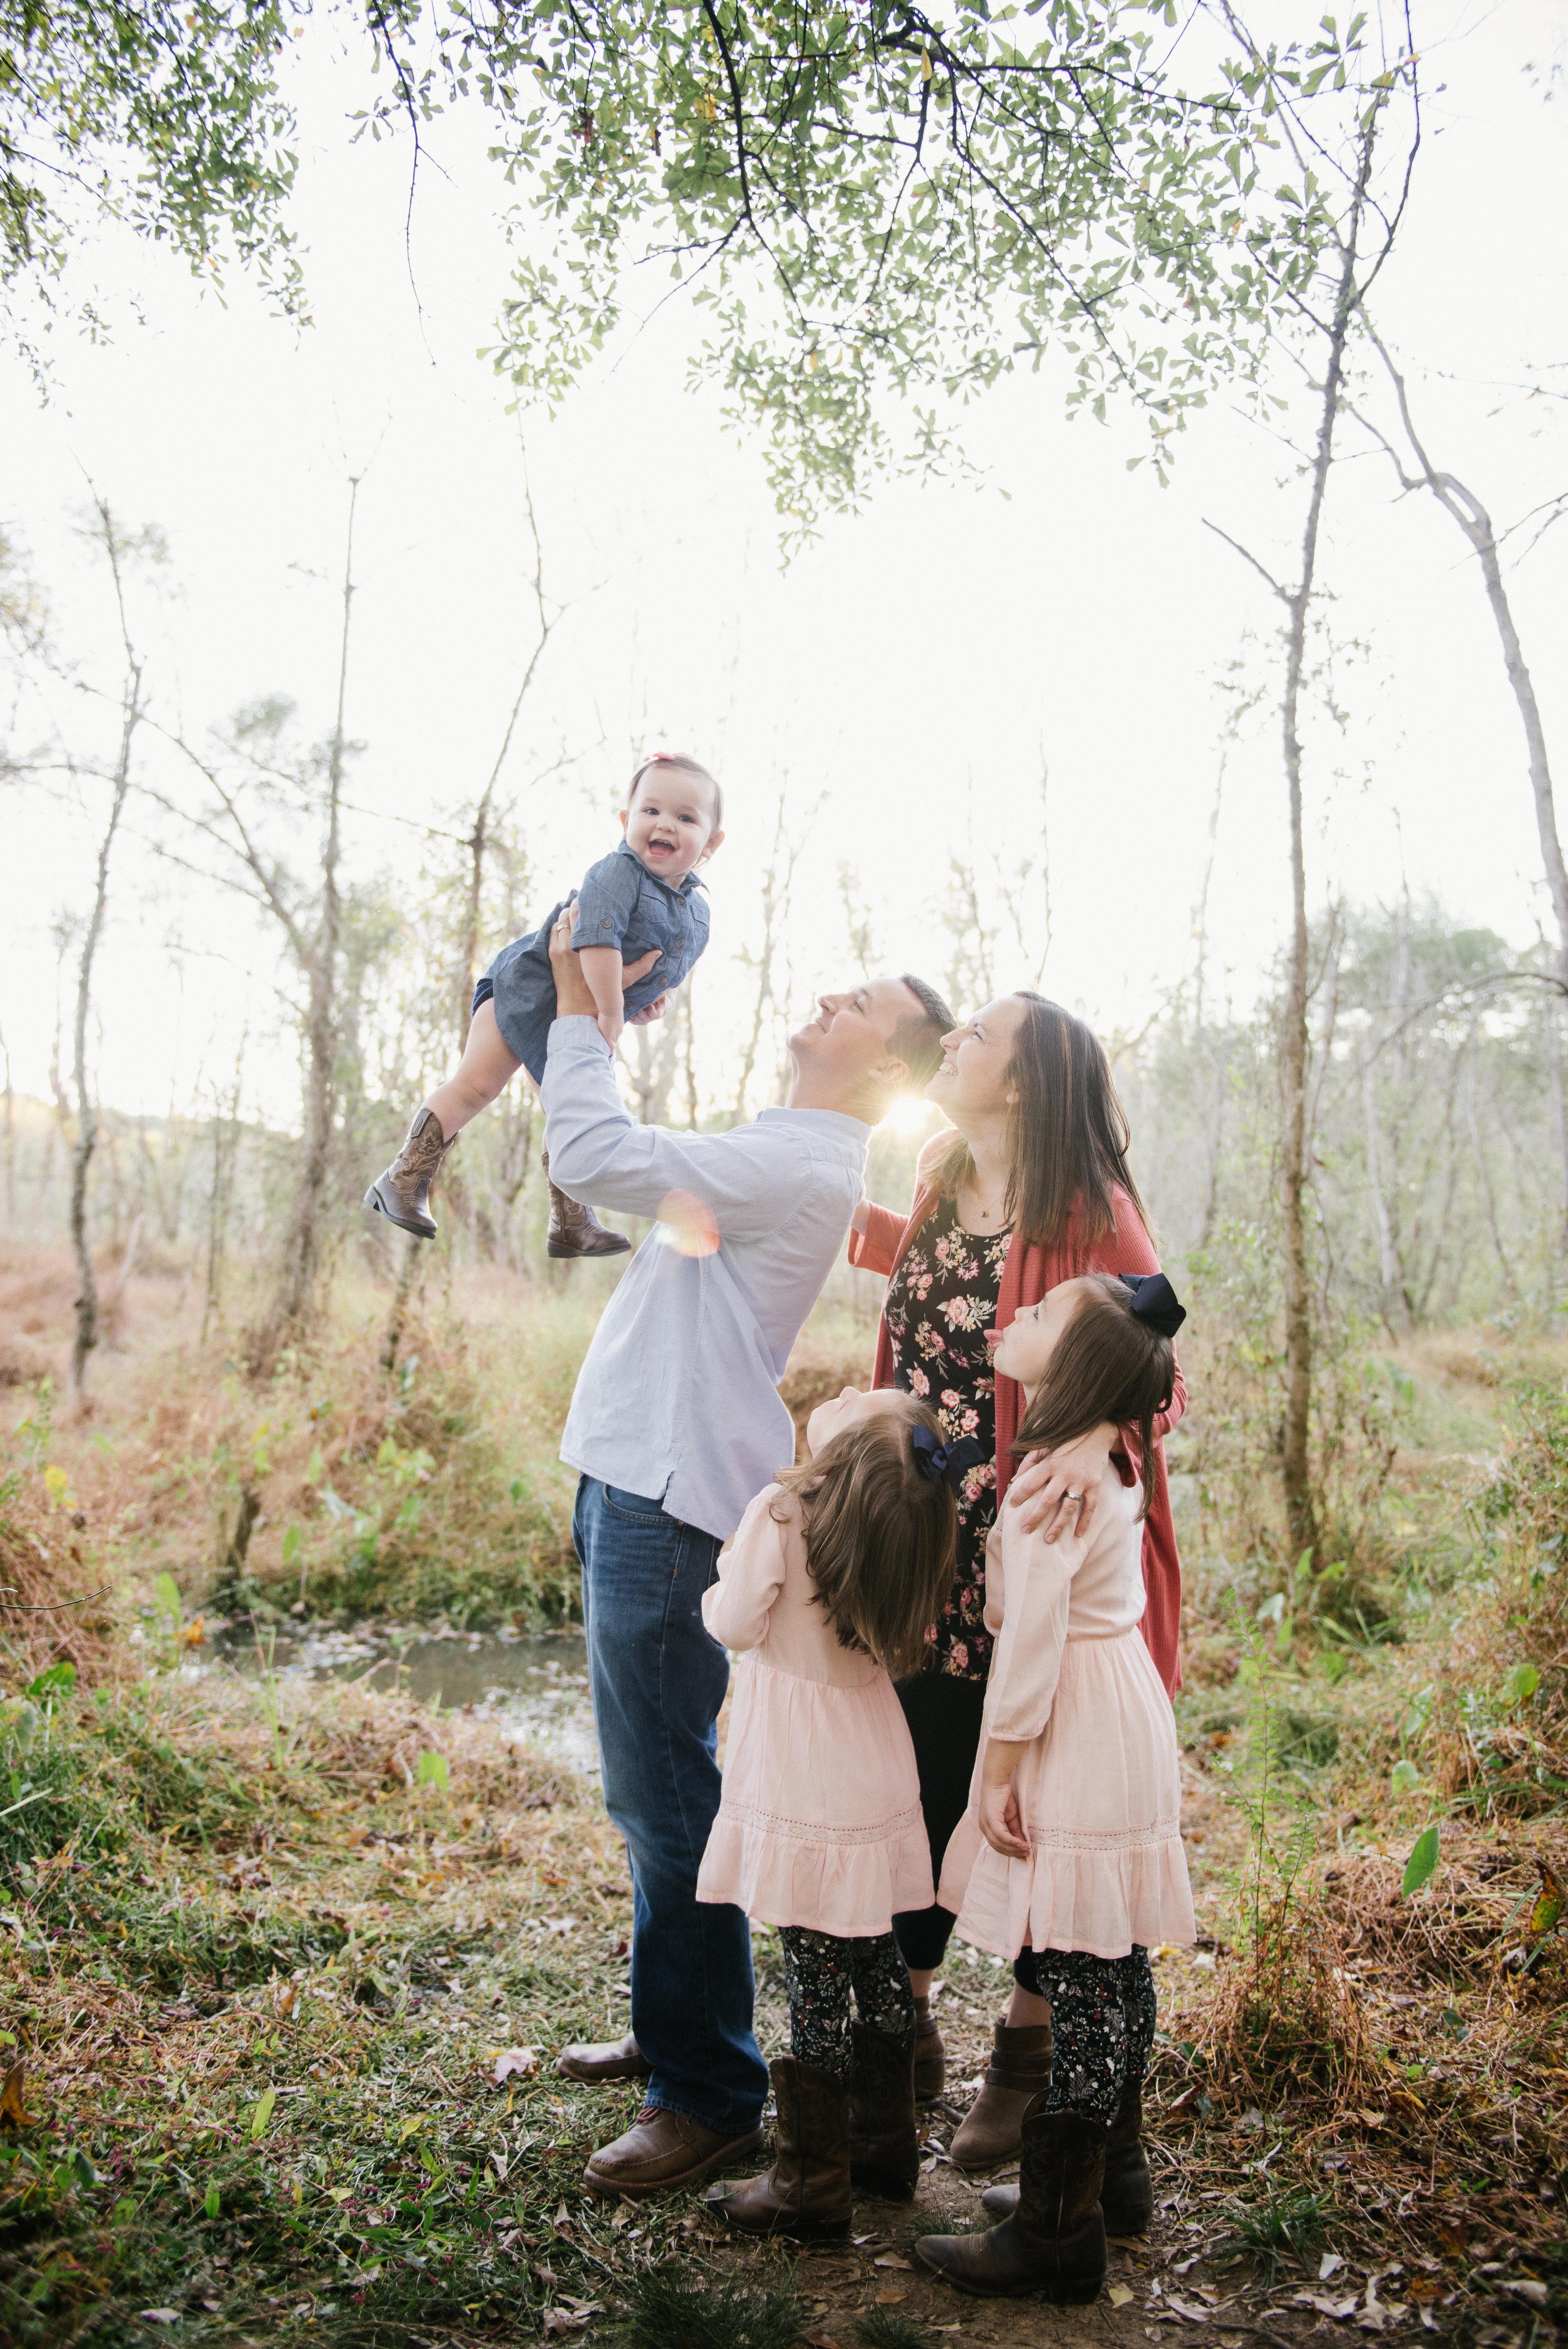 rockhillfamilyphotographer-8